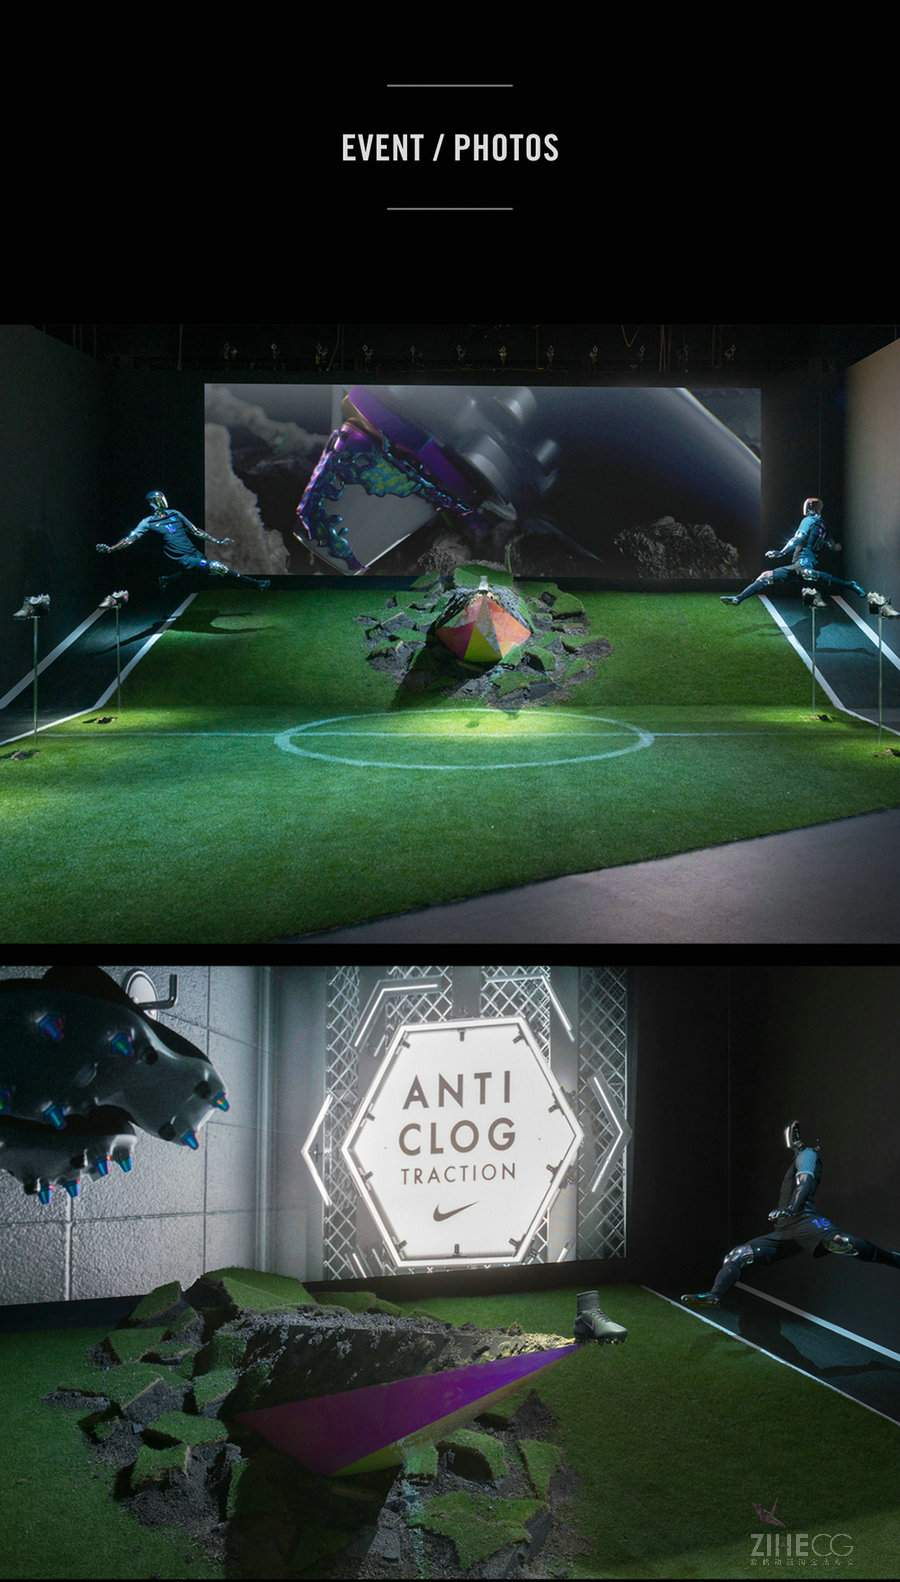 耐克运动鞋最新TVC广告 Nike Anti-Clog Traction